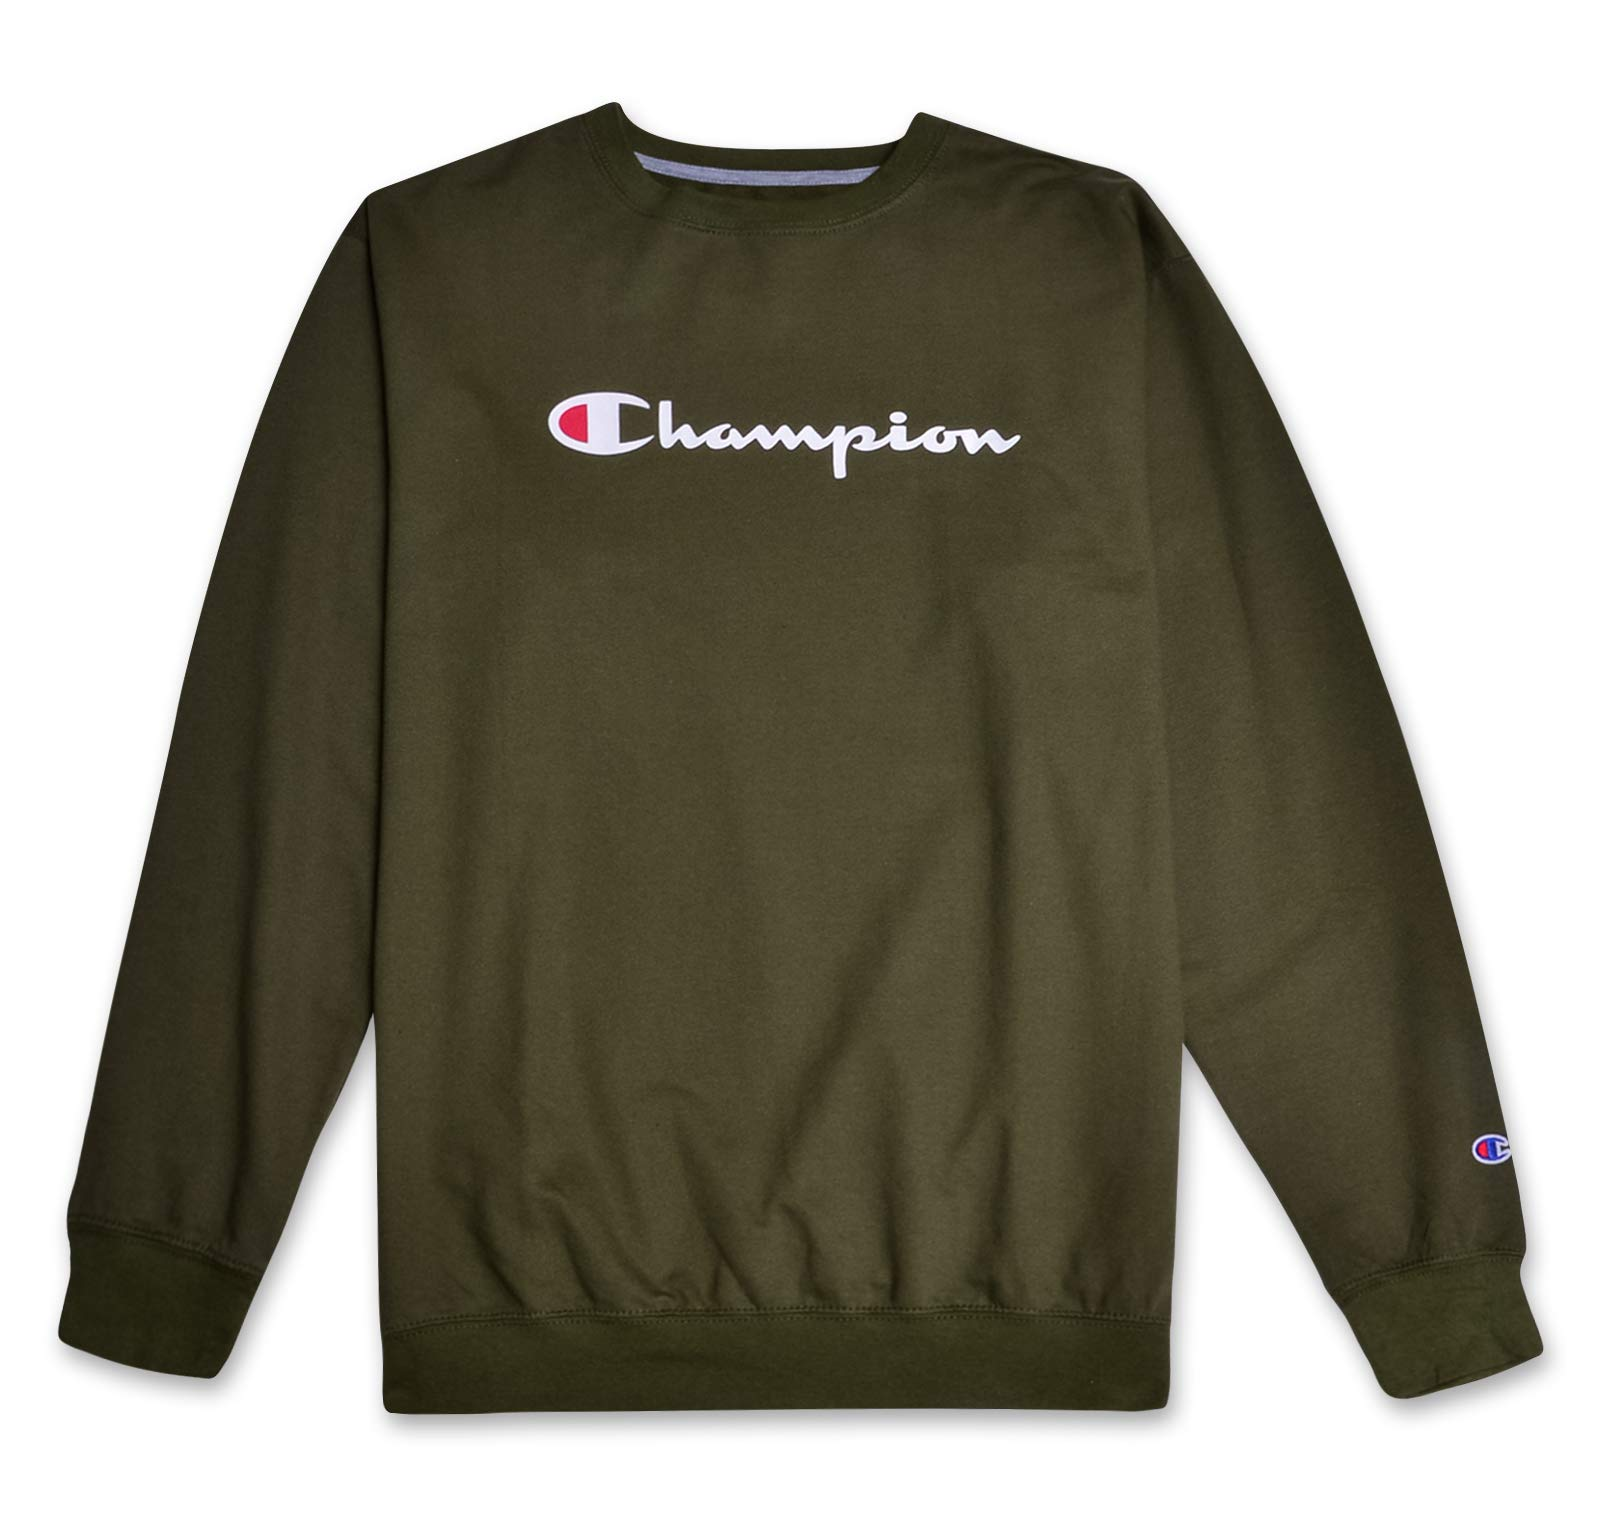 Champion Sweatshirt Mens Big and Tall Logo Sweater Crewneck Sweatshirt